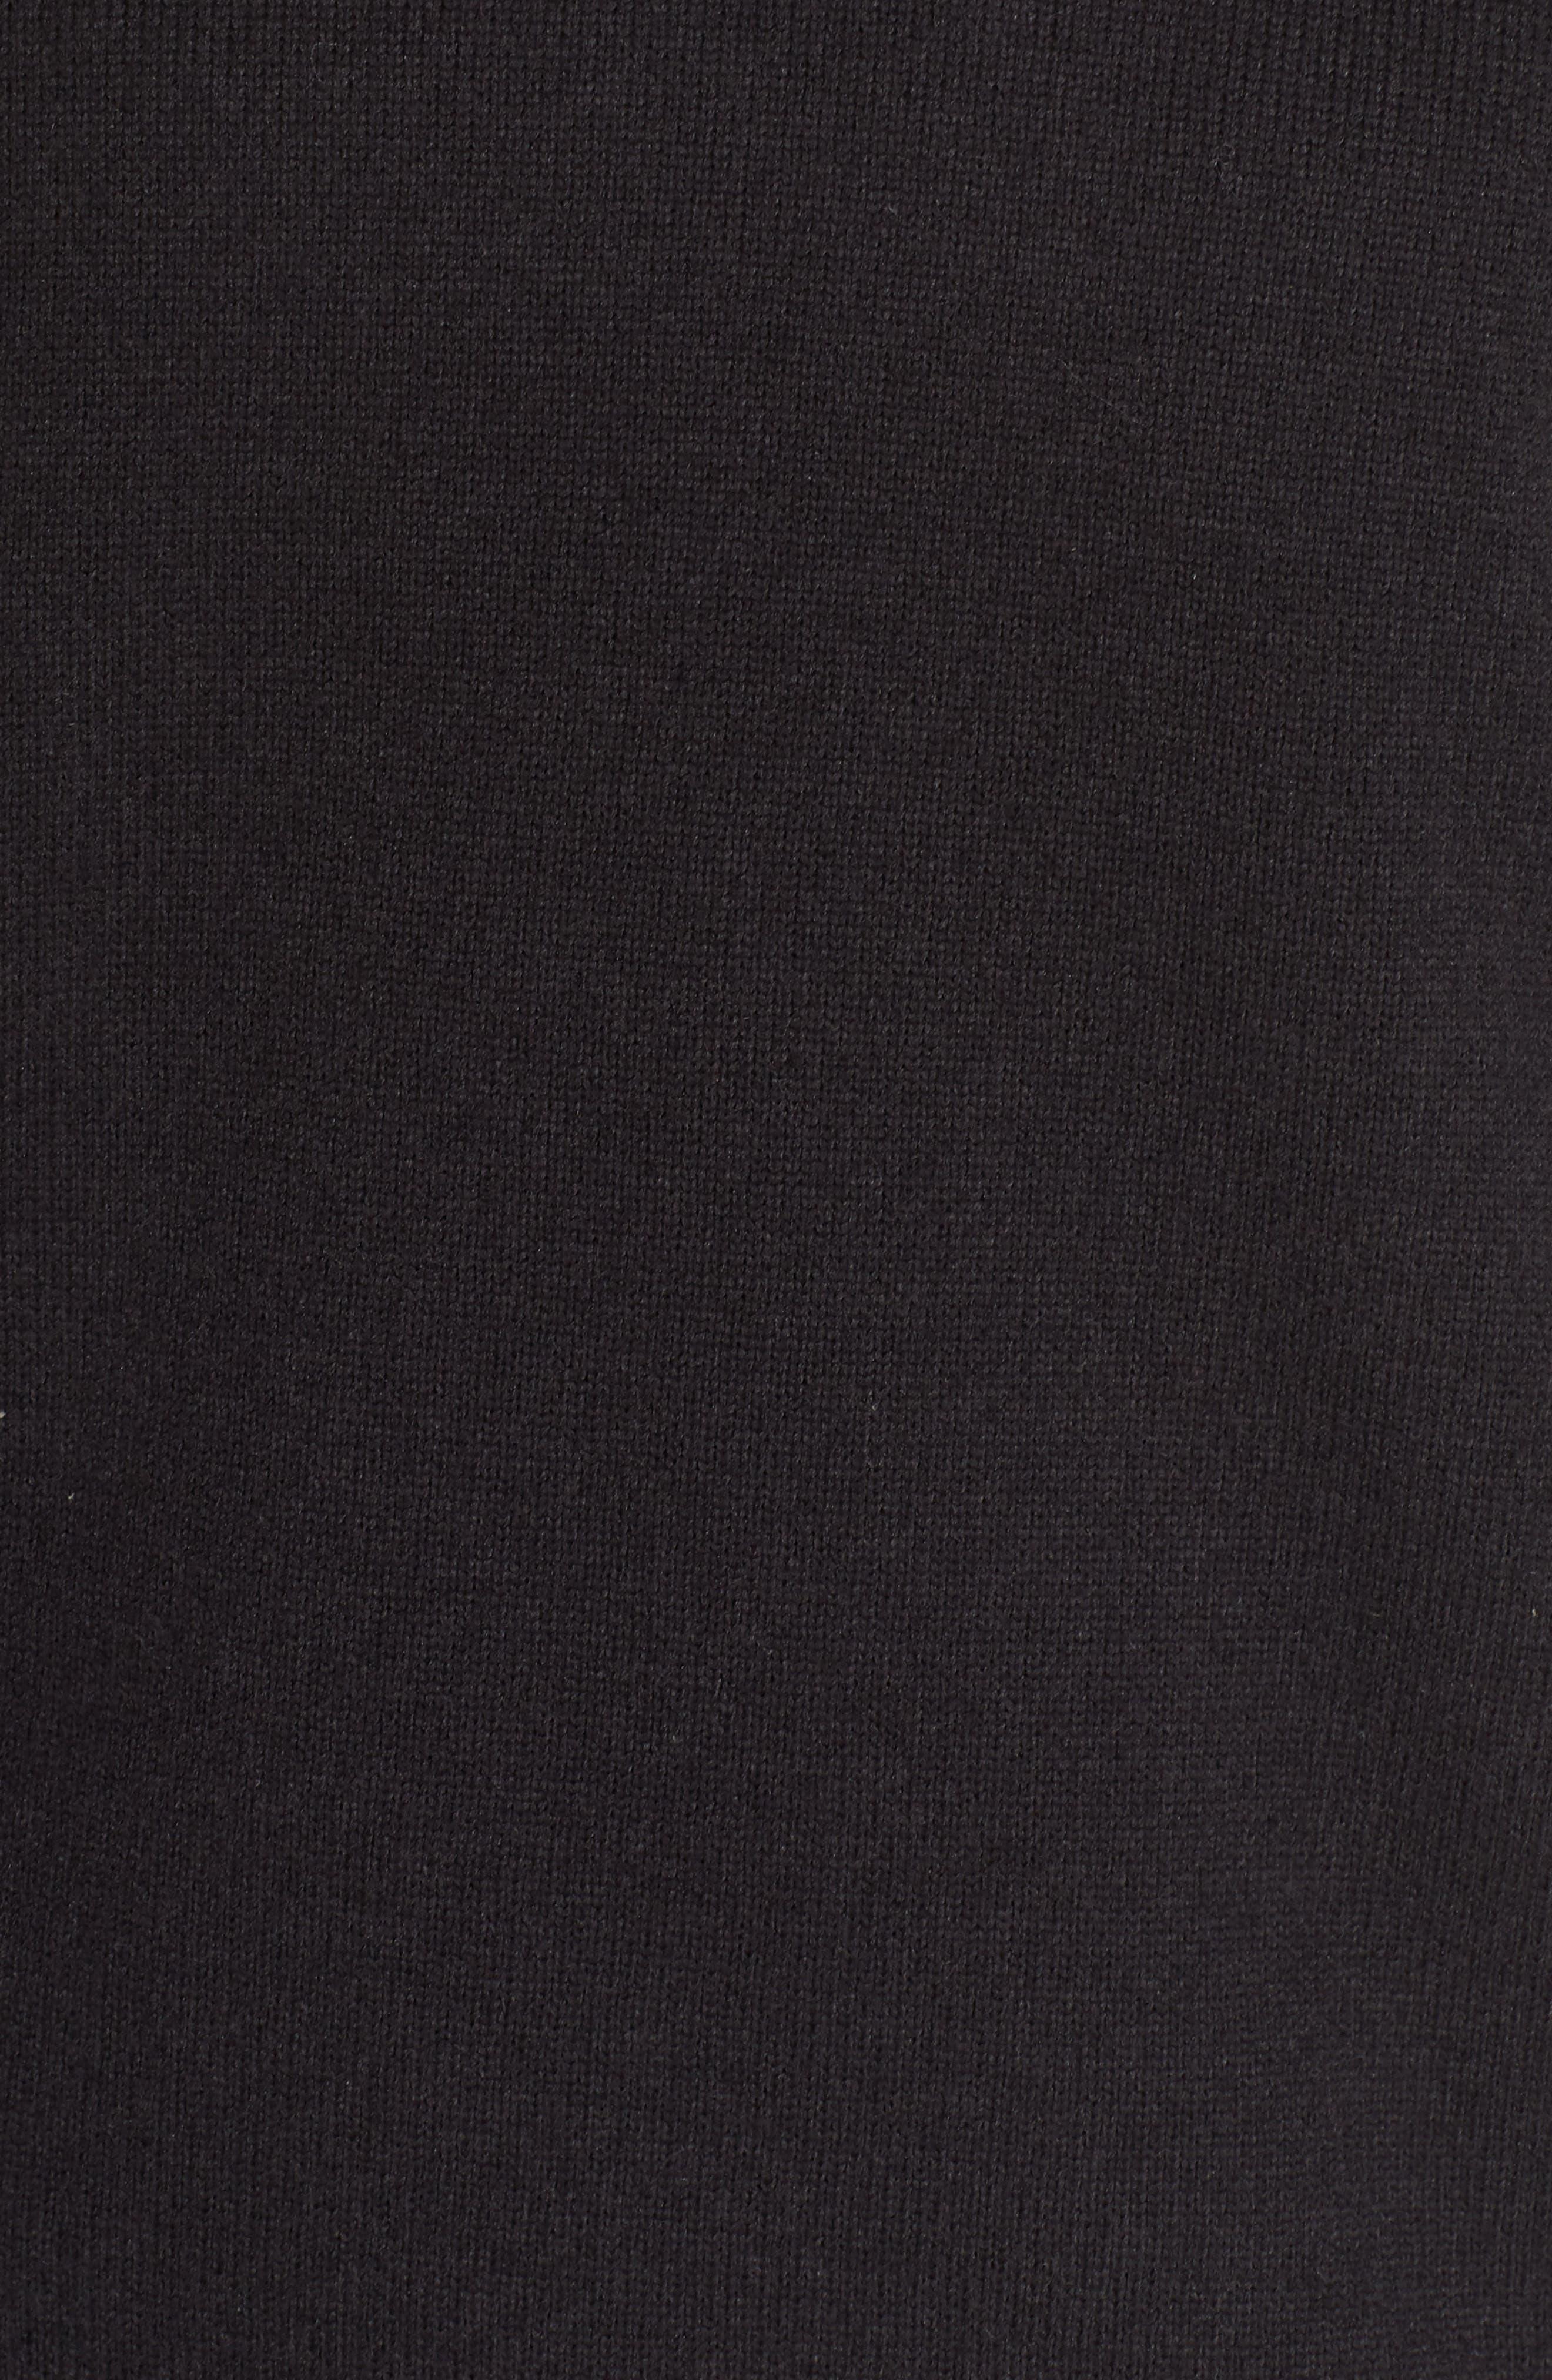 Lightweight Better Sweater Fleece,                             Alternate thumbnail 6, color,                             BLACK